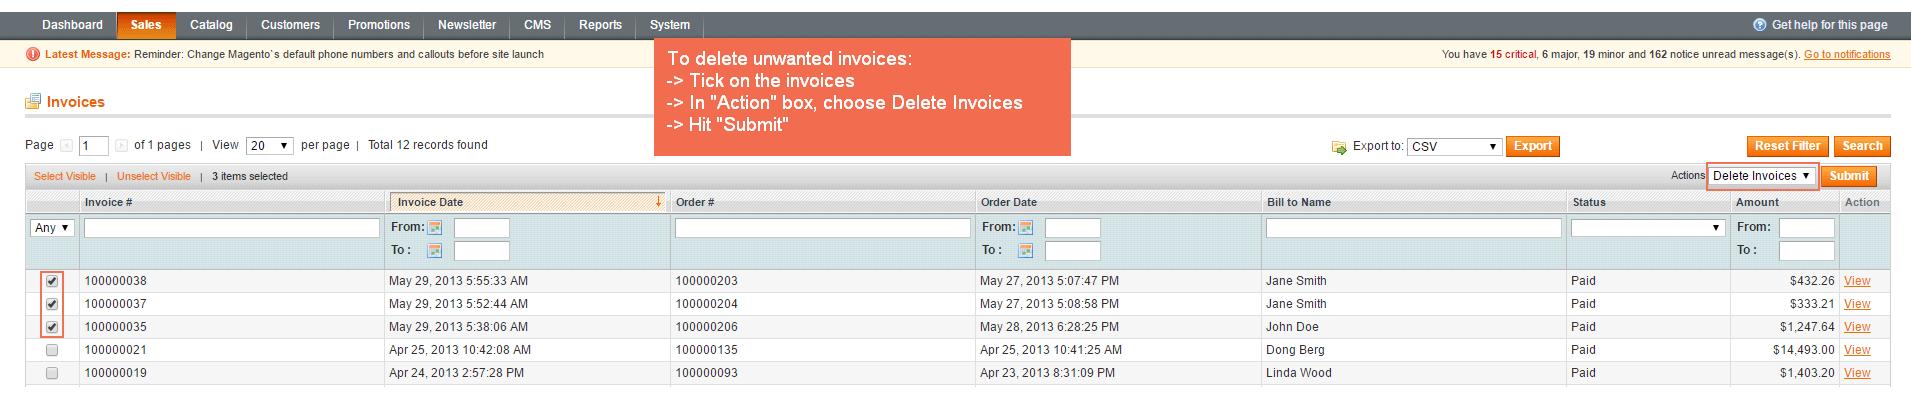 magento-delete-orders-delete-invoices